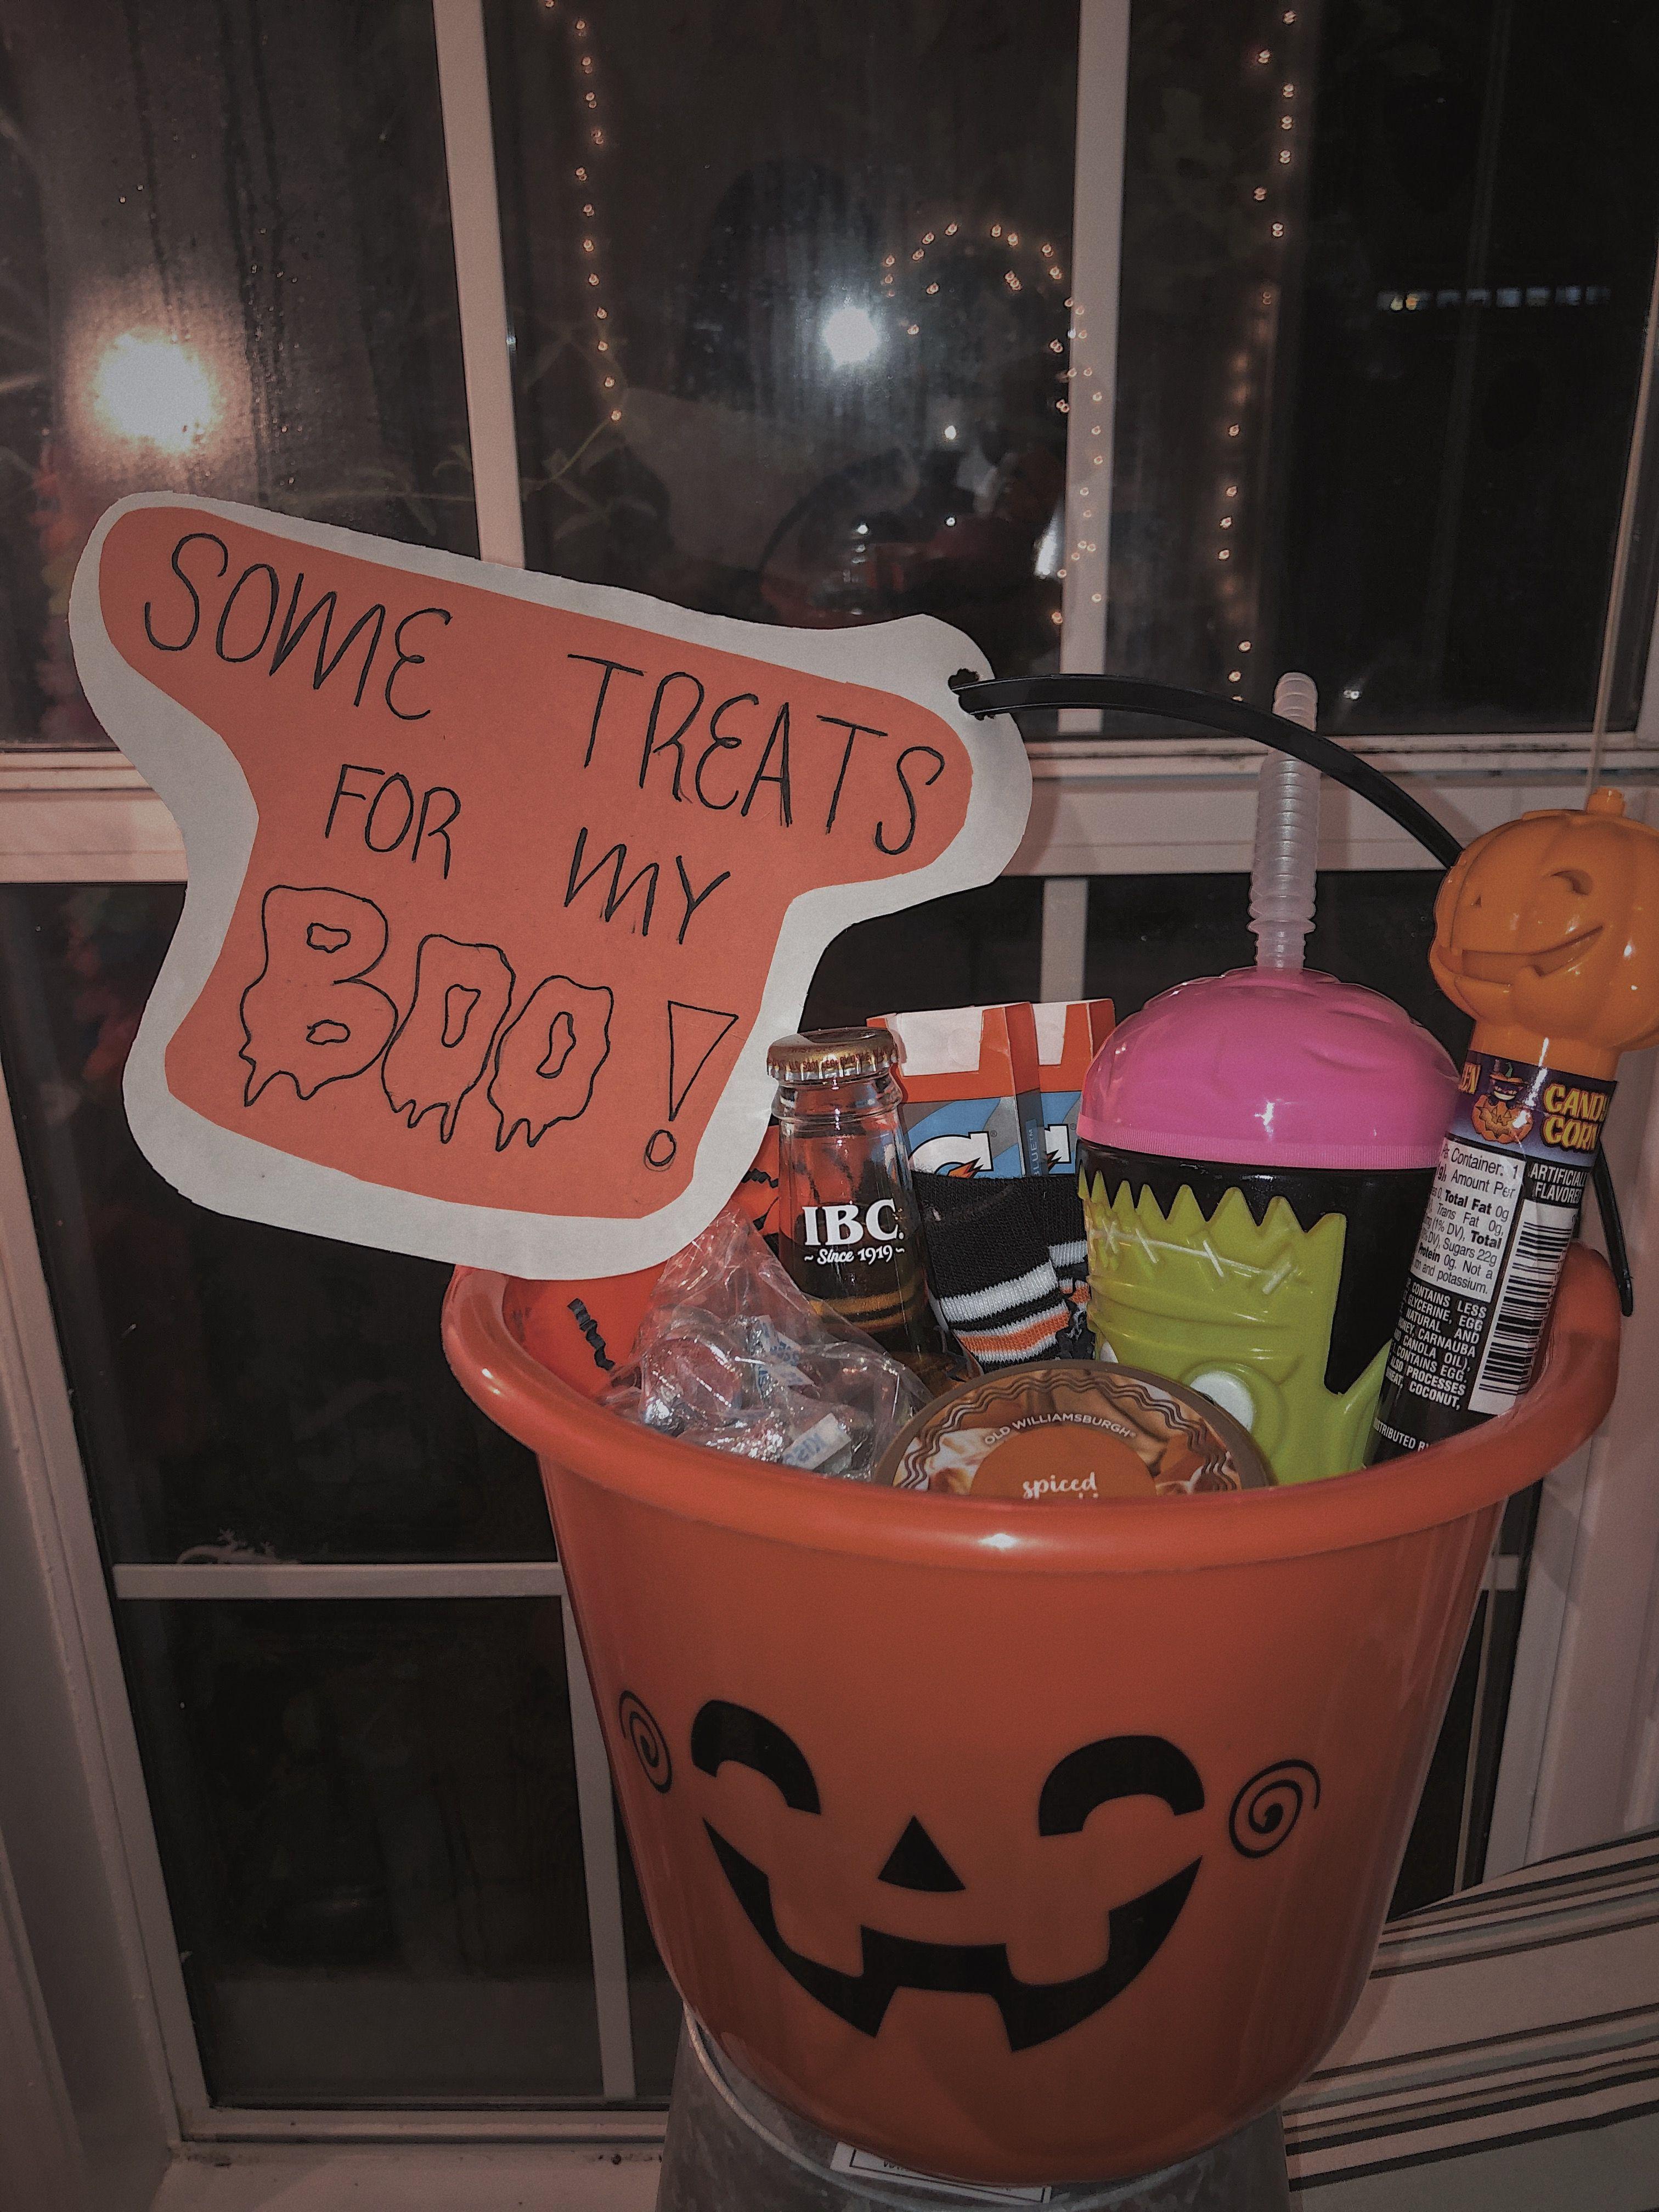 Spooky Szn Basket Forboyfriend Boyfriend Halloween Halloweenbasket Boo Candy Giftidea Halloween Care Packages Halloween Gift Baskets Diy Halloween Gifts